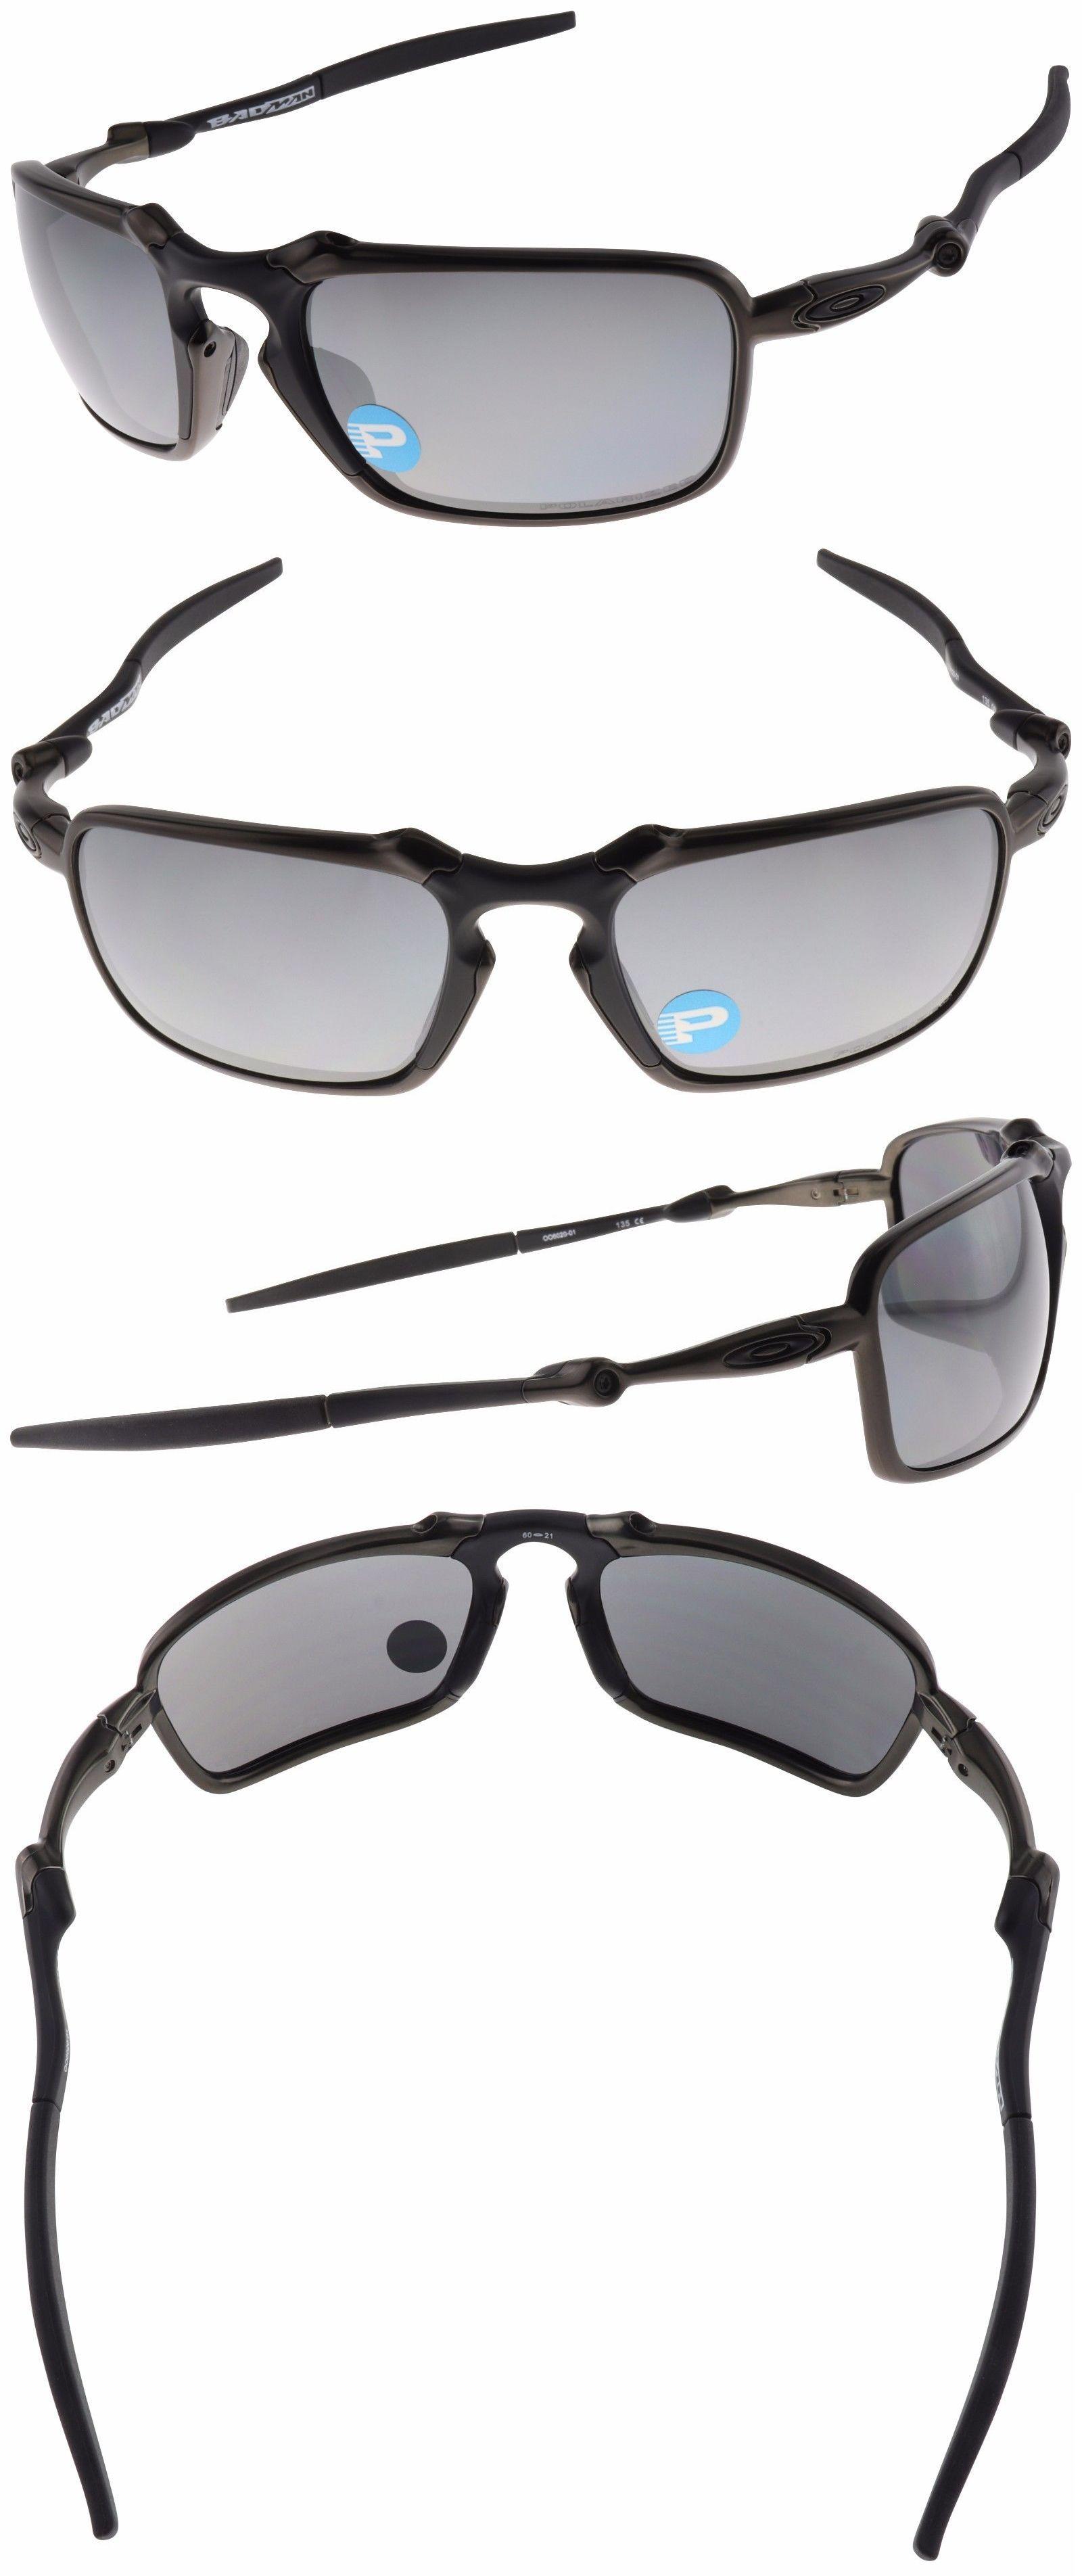 64ceb38ff2 Sunglasses 79720  Oakley Badman Sunglasses Oo6020-01 Dark Carbon ...